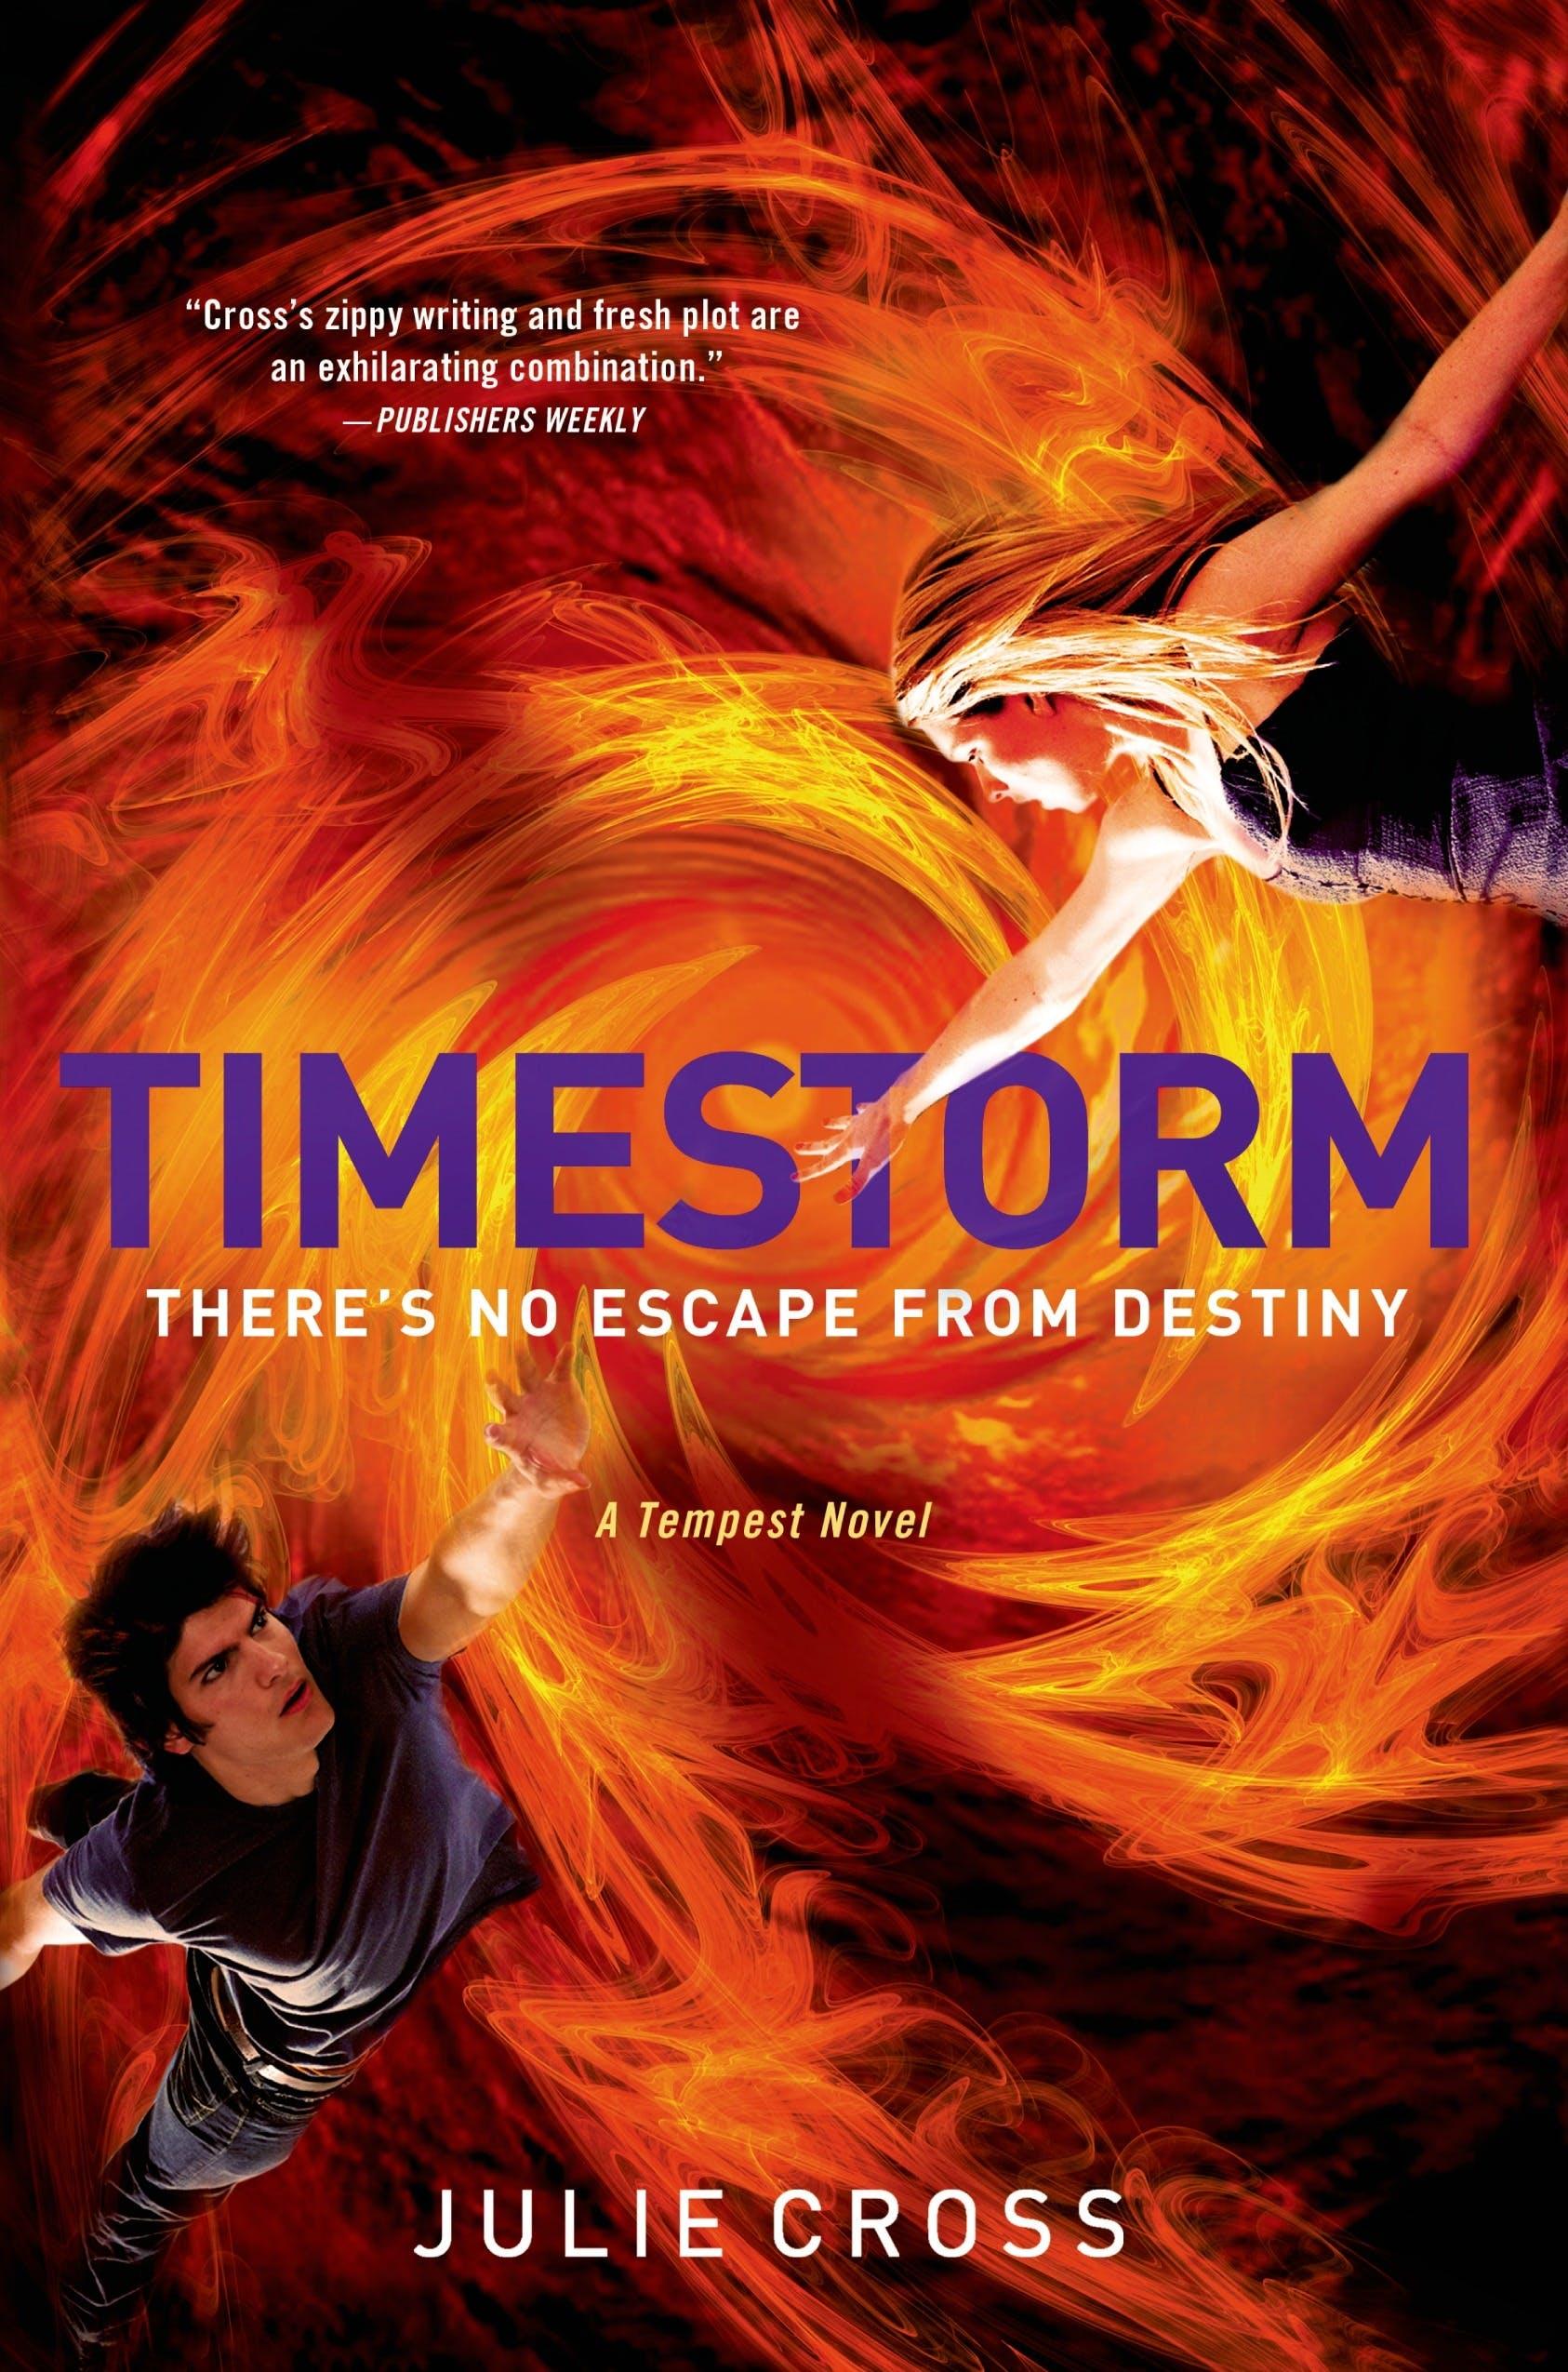 Image of Timestorm